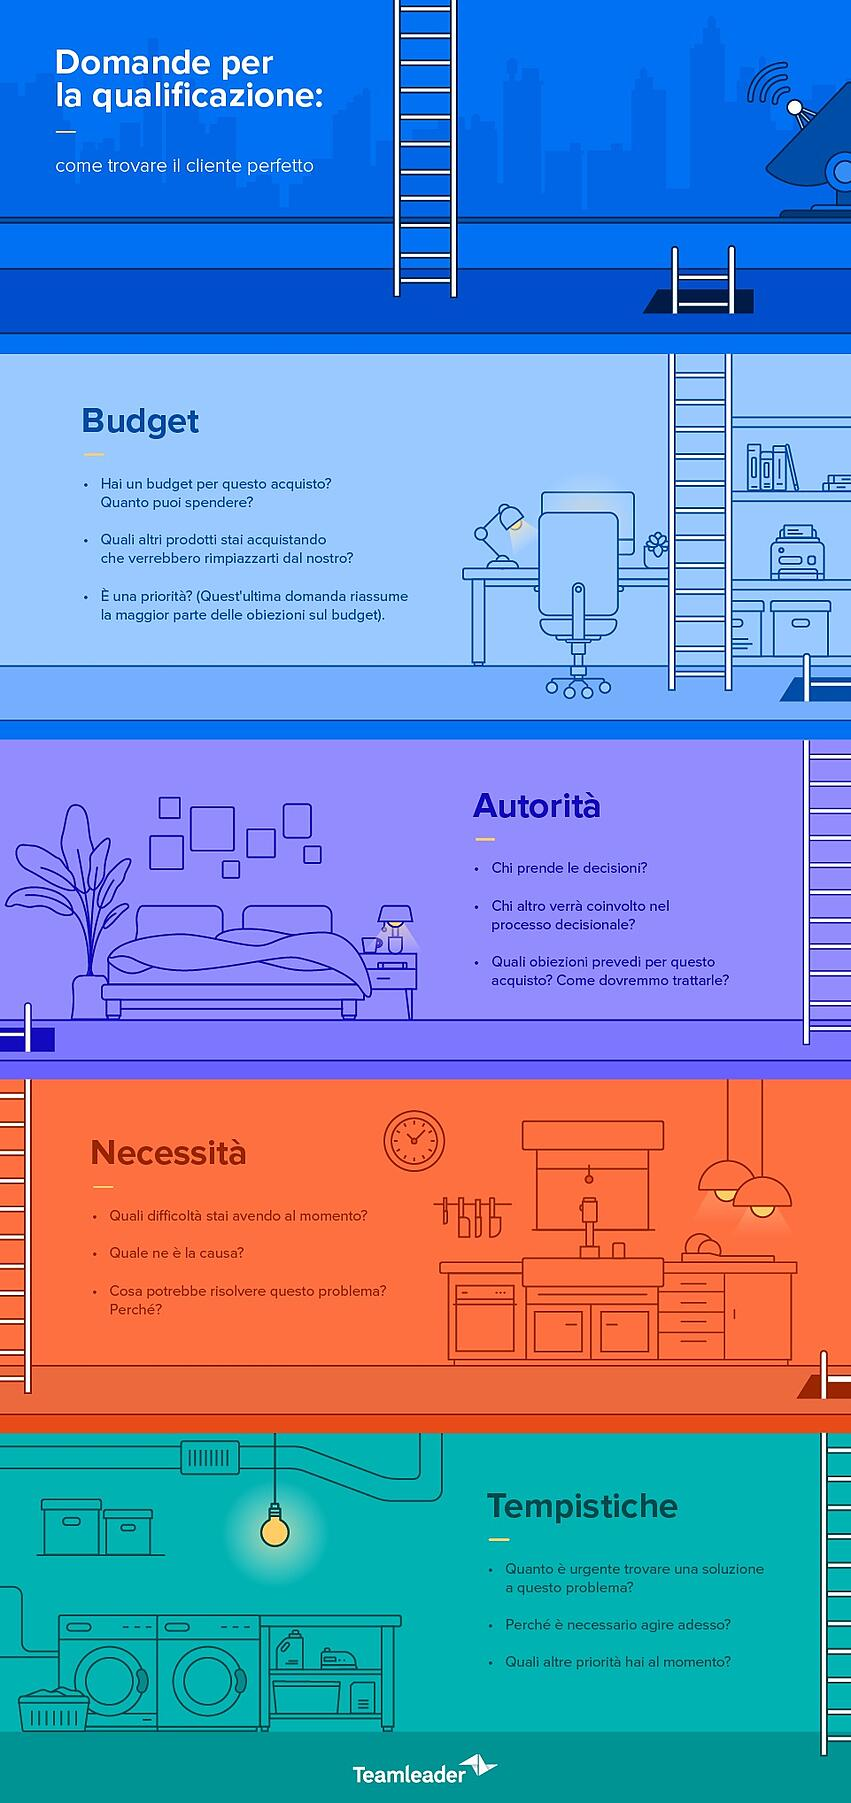 Blog3_QualifyLeads_Infographic_IT.jpg